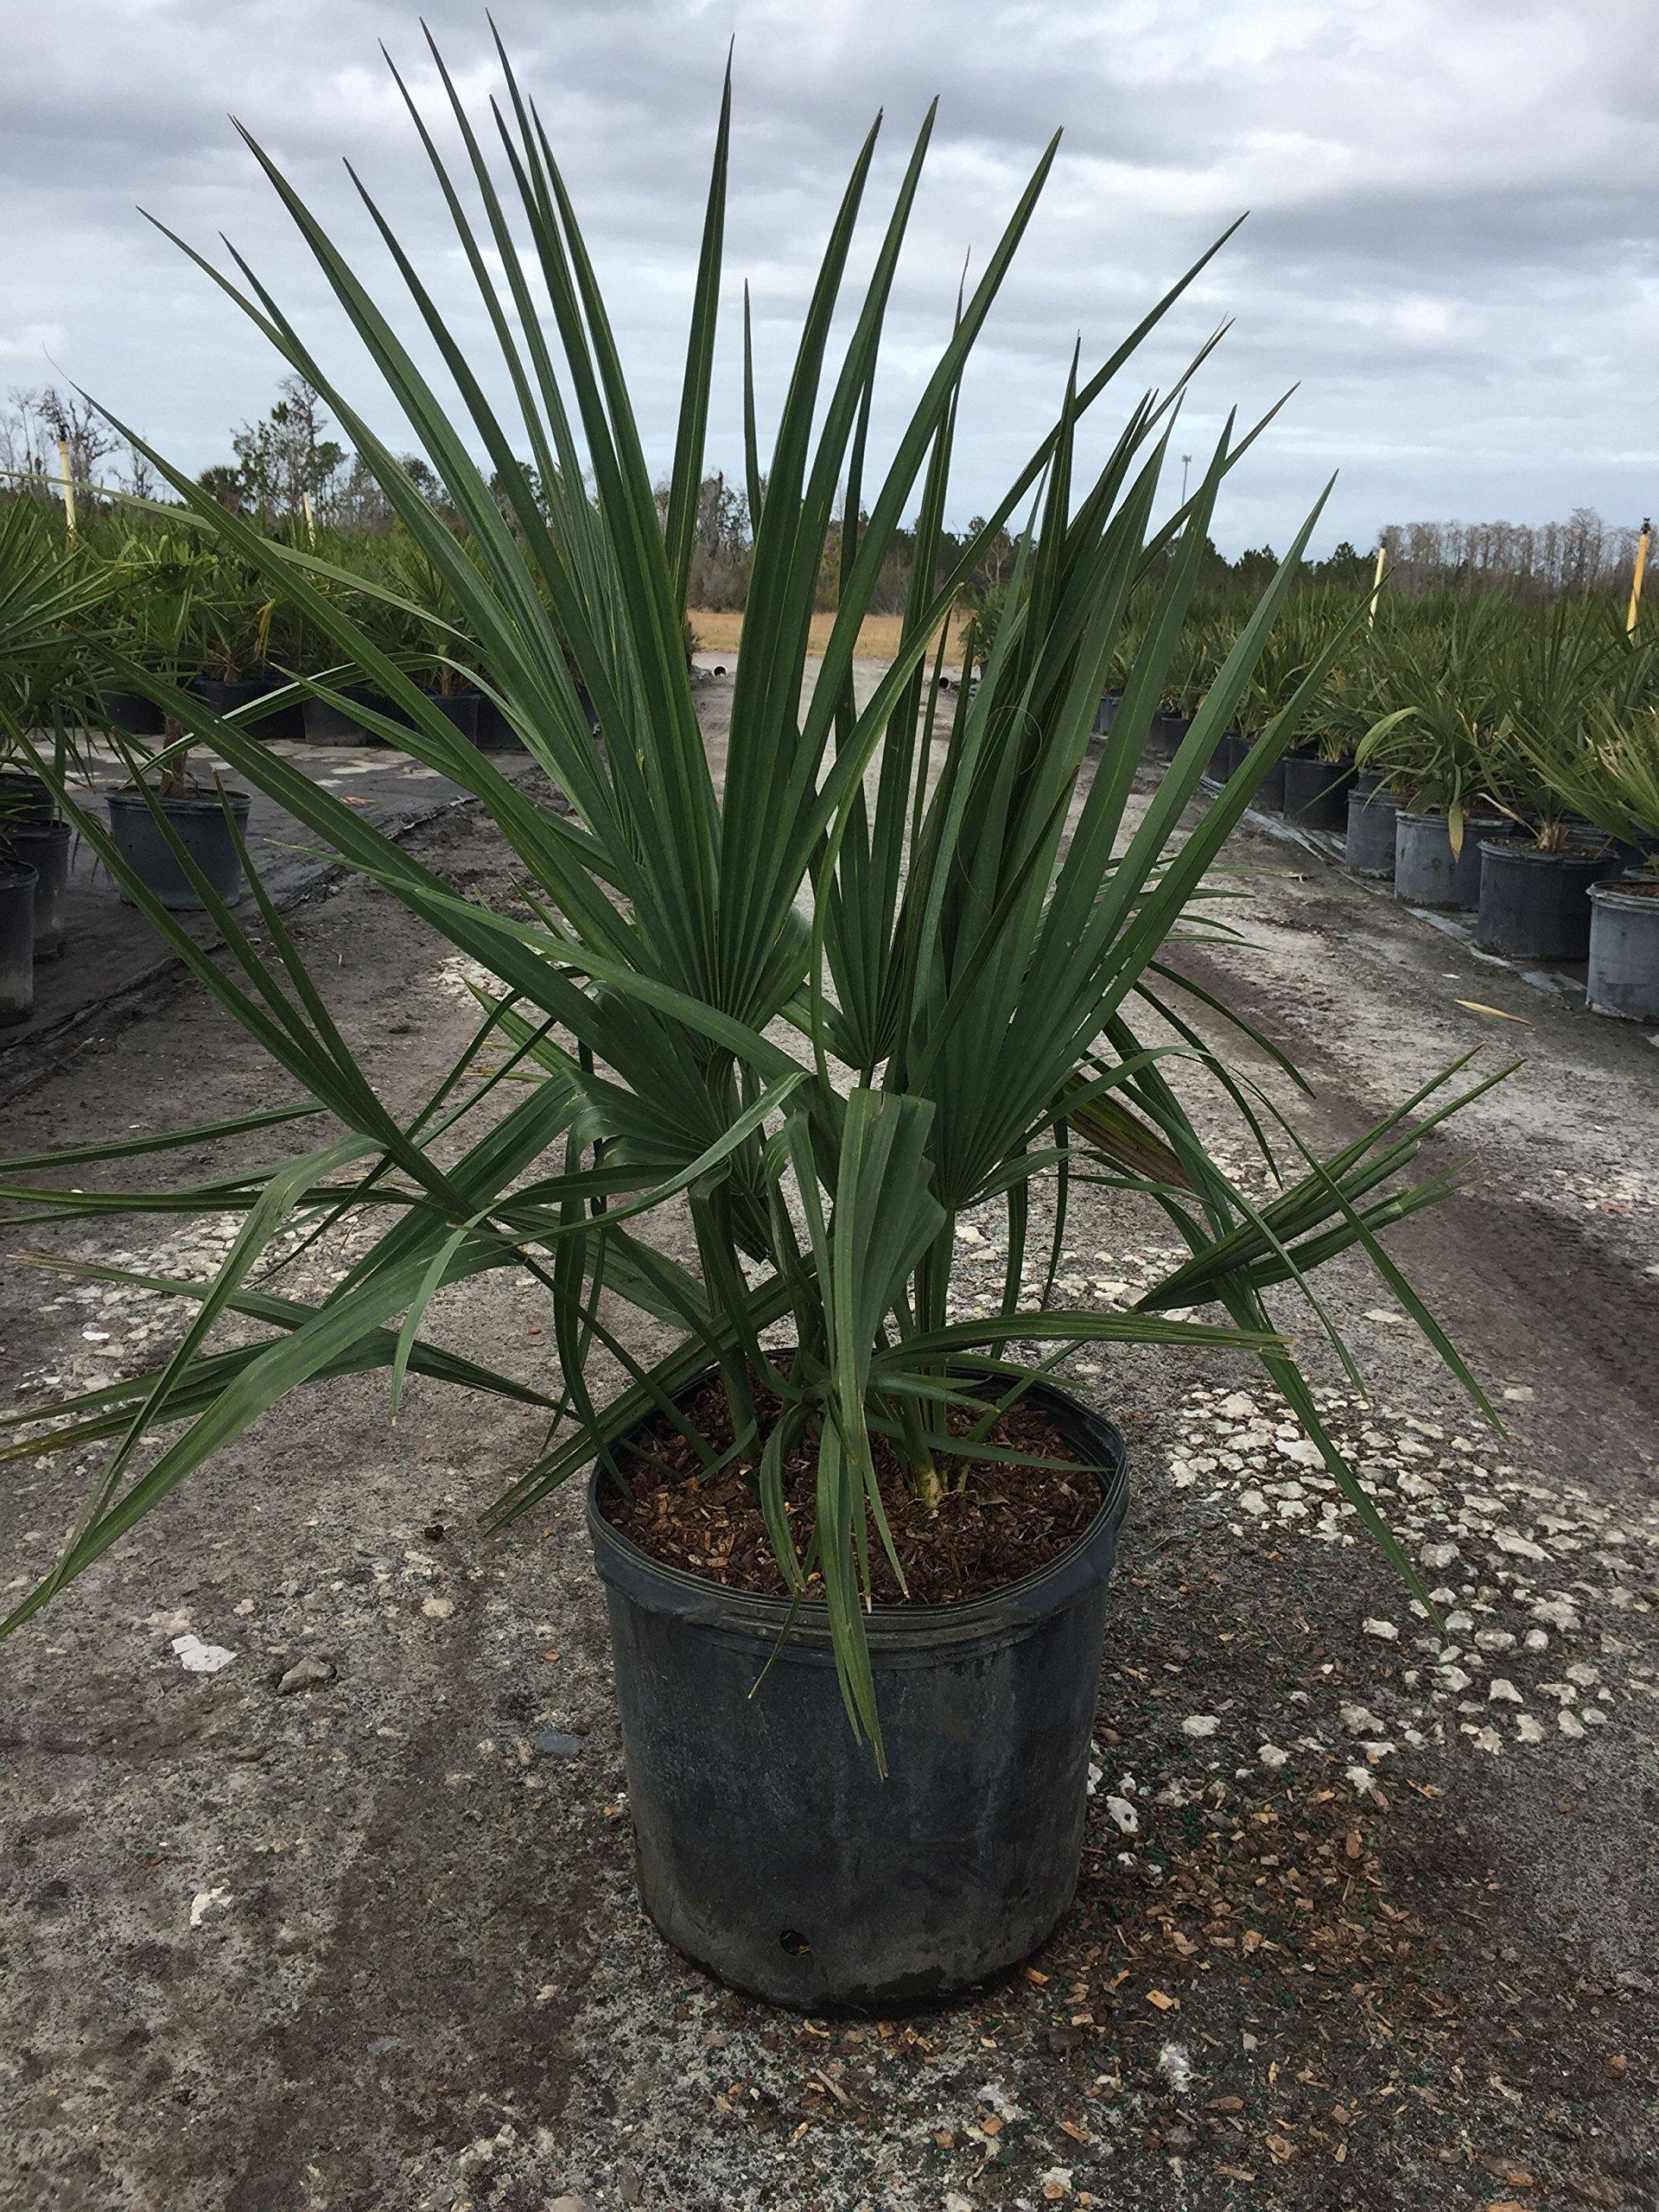 PlantVine Sabal Minor, Dwarf Blue-stem Palmetto - Large - 8-10 Inch Pot (3 Gallon), Live Plant - 4 Pack by PlantVine (Image #3)